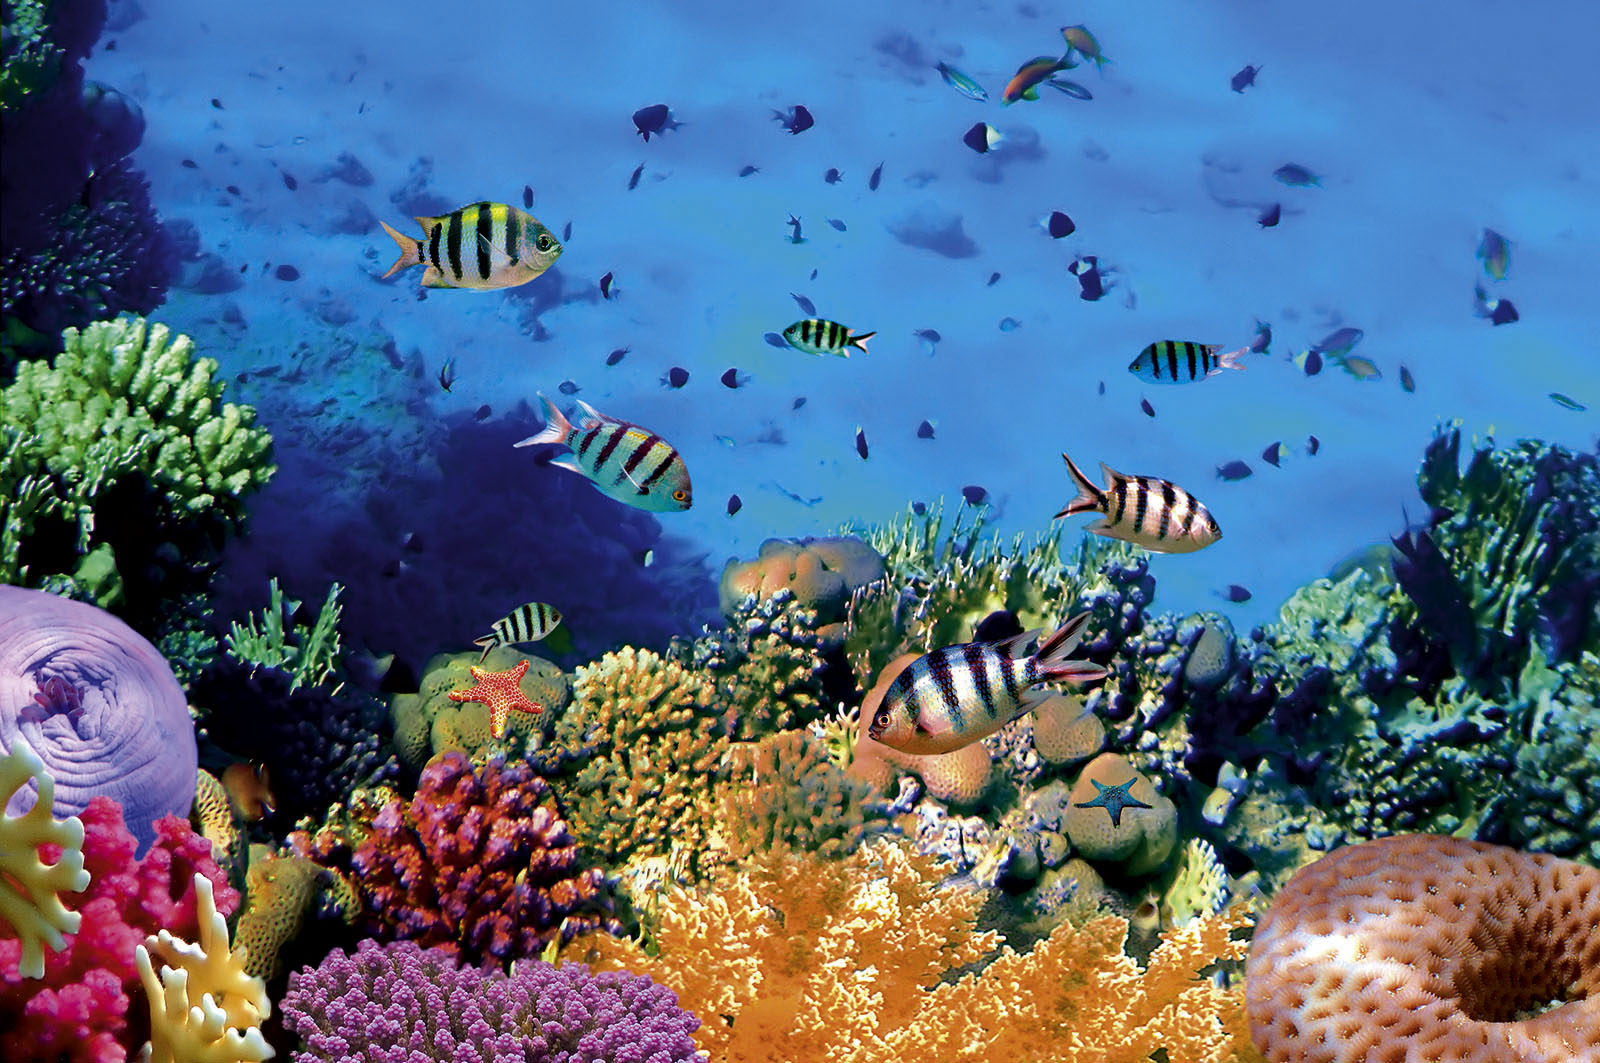 Limakaki Fakta Keunikan Taman Laut Bunaken Kamu Tahu Kota Manado